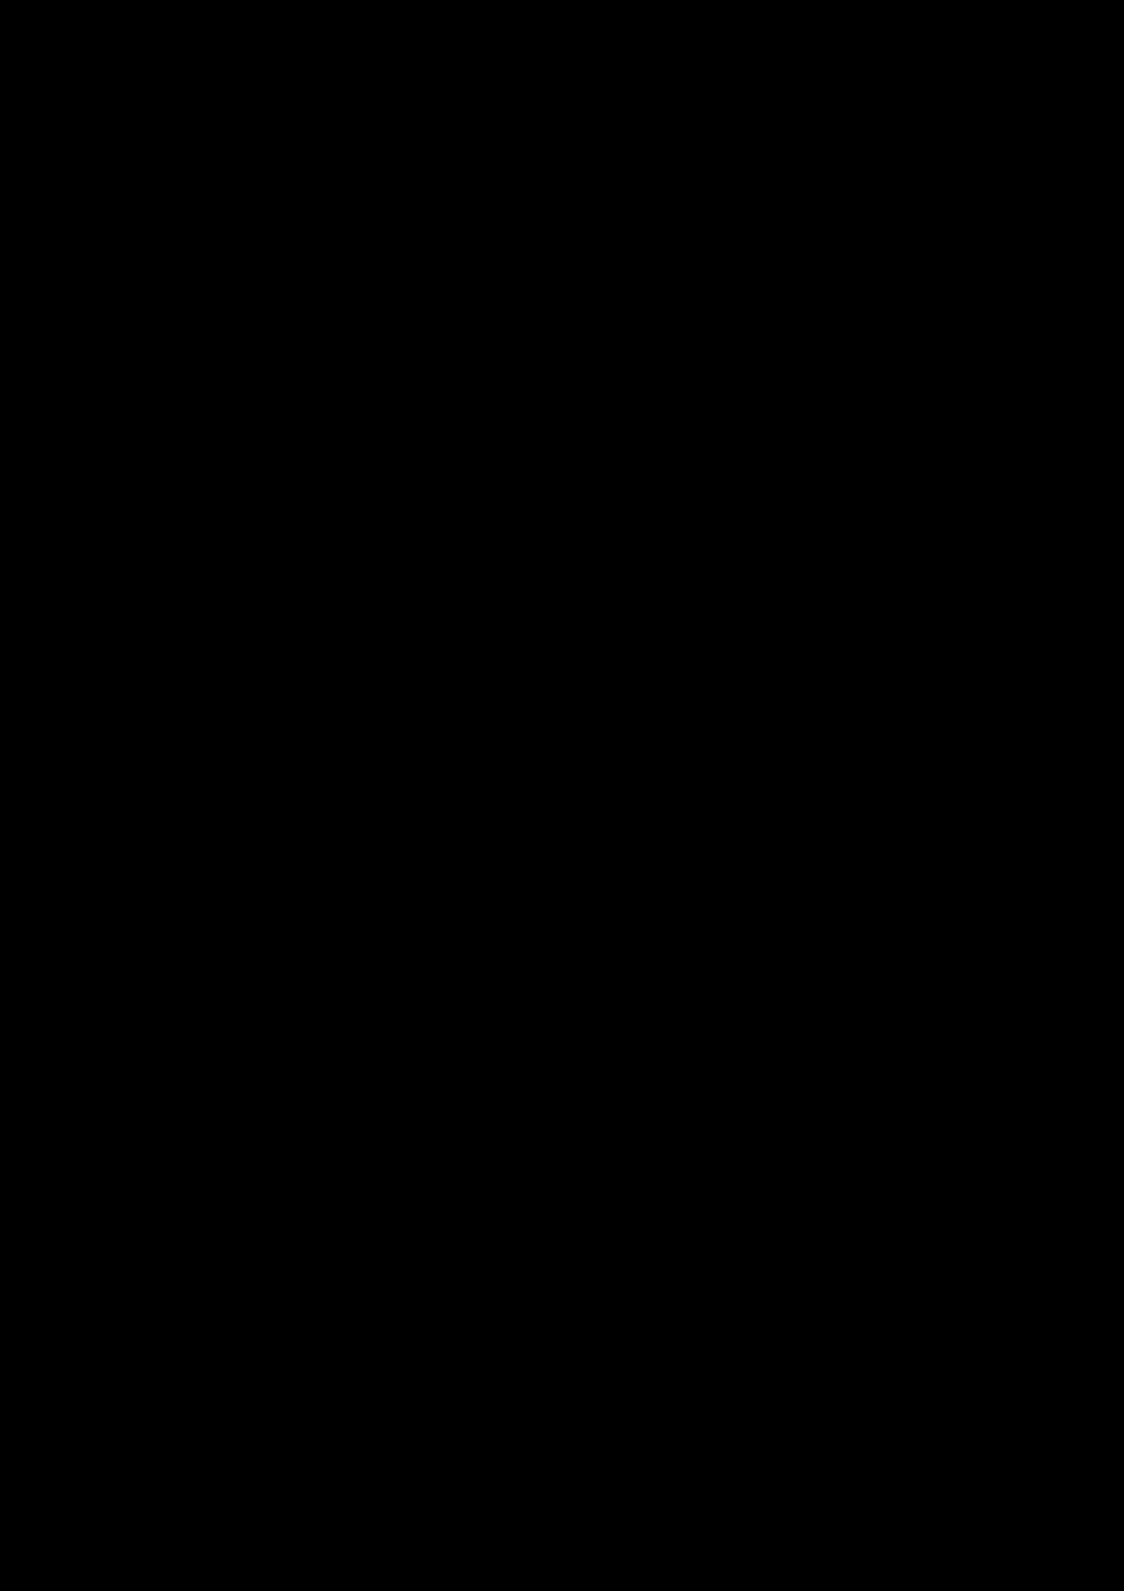 305778_1124x